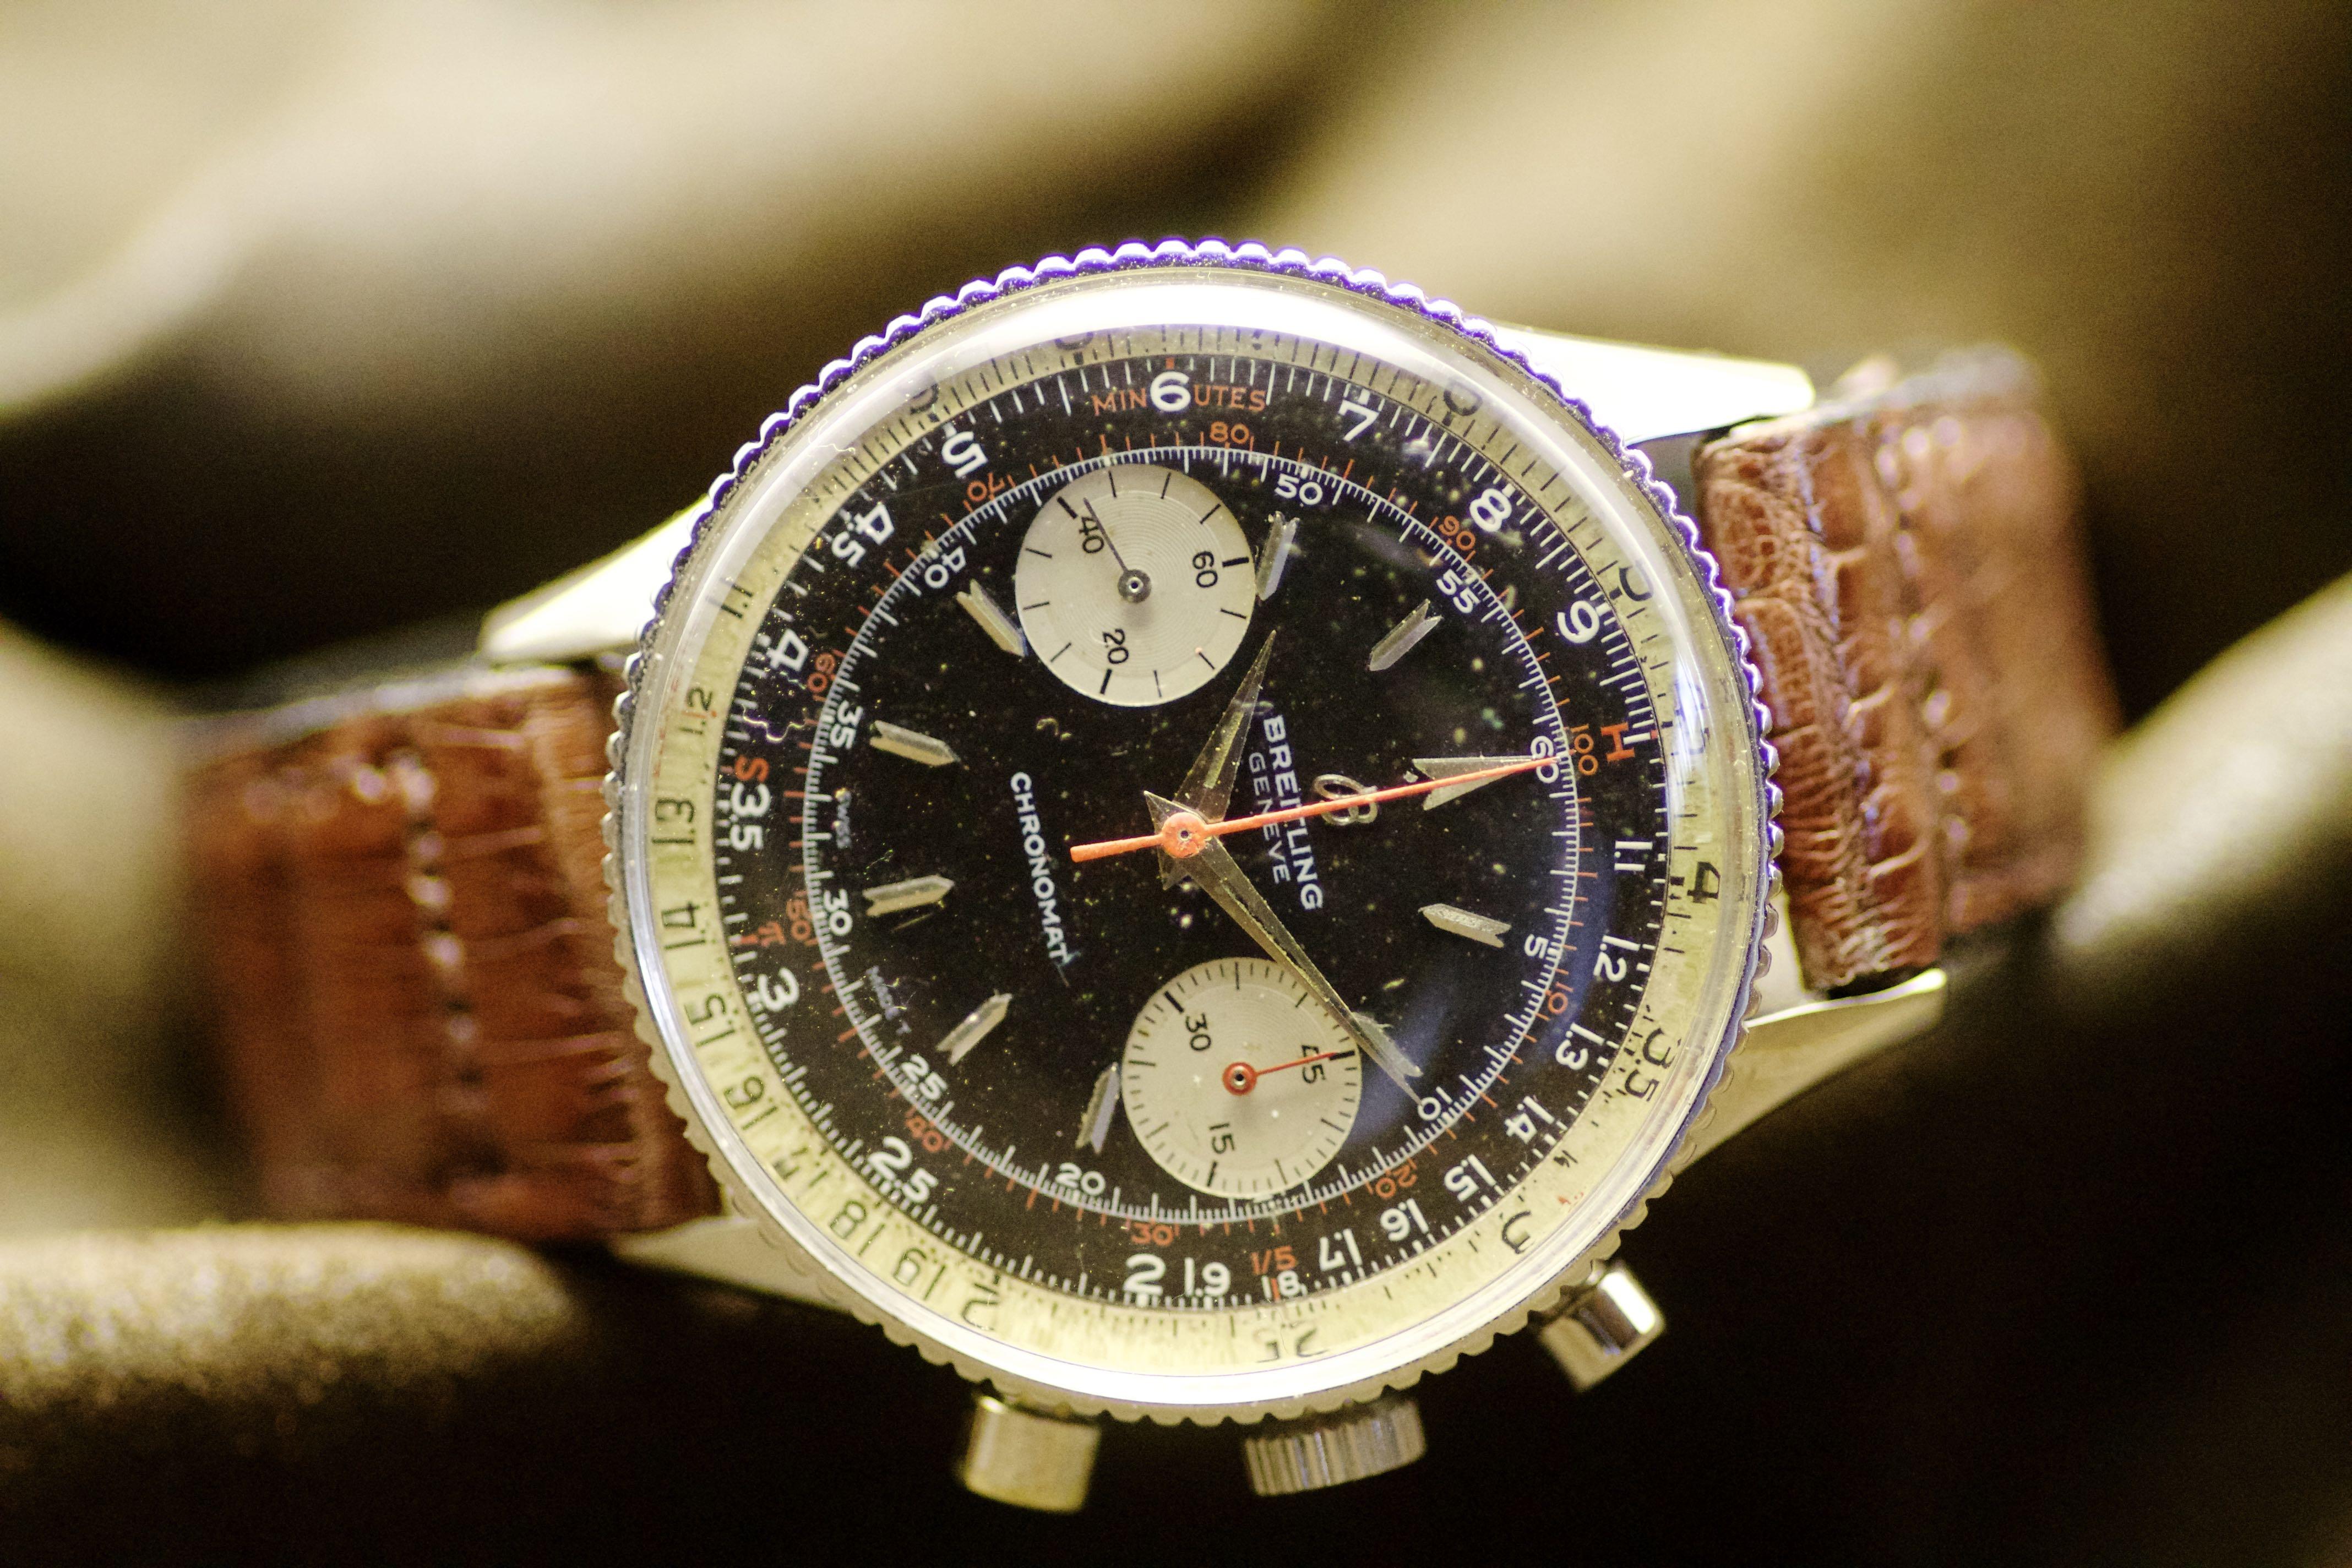 Breitling Chronomat ref 808 - Vintage Breitling watches ...